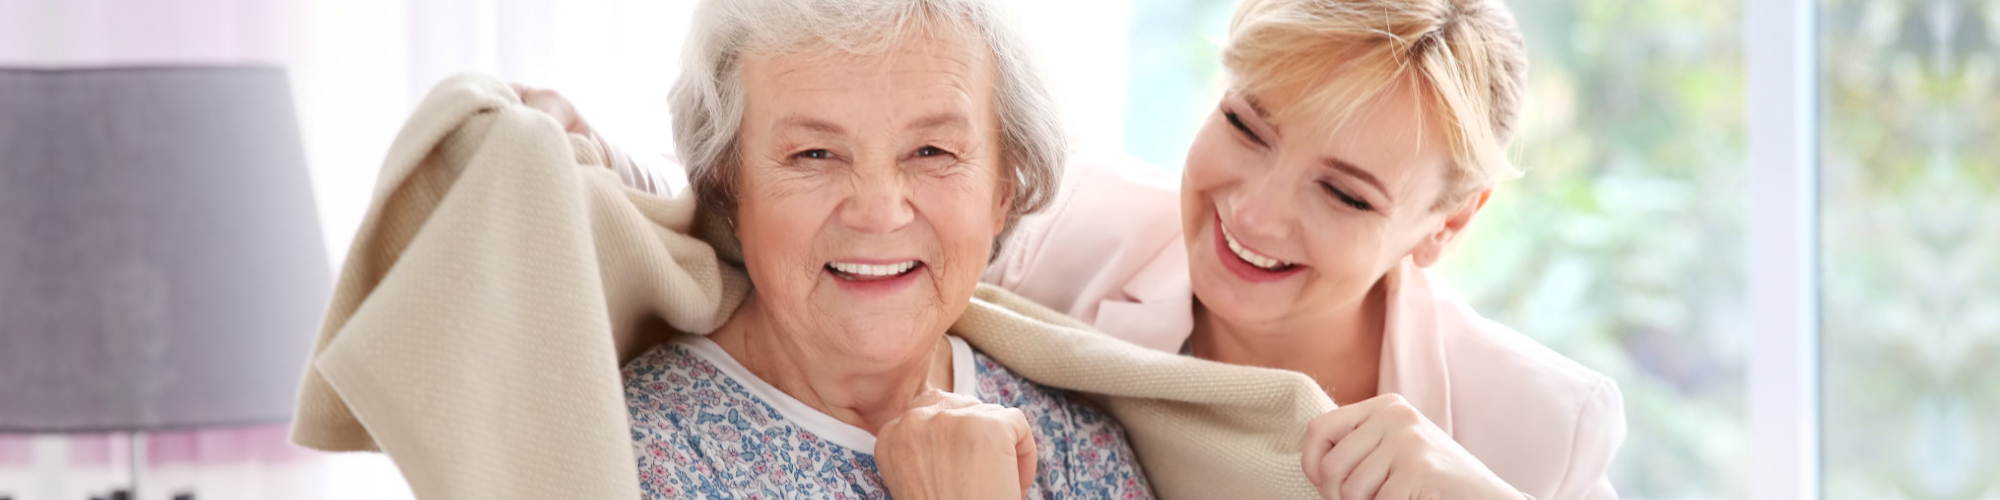 caregive giving blanket to her elderly